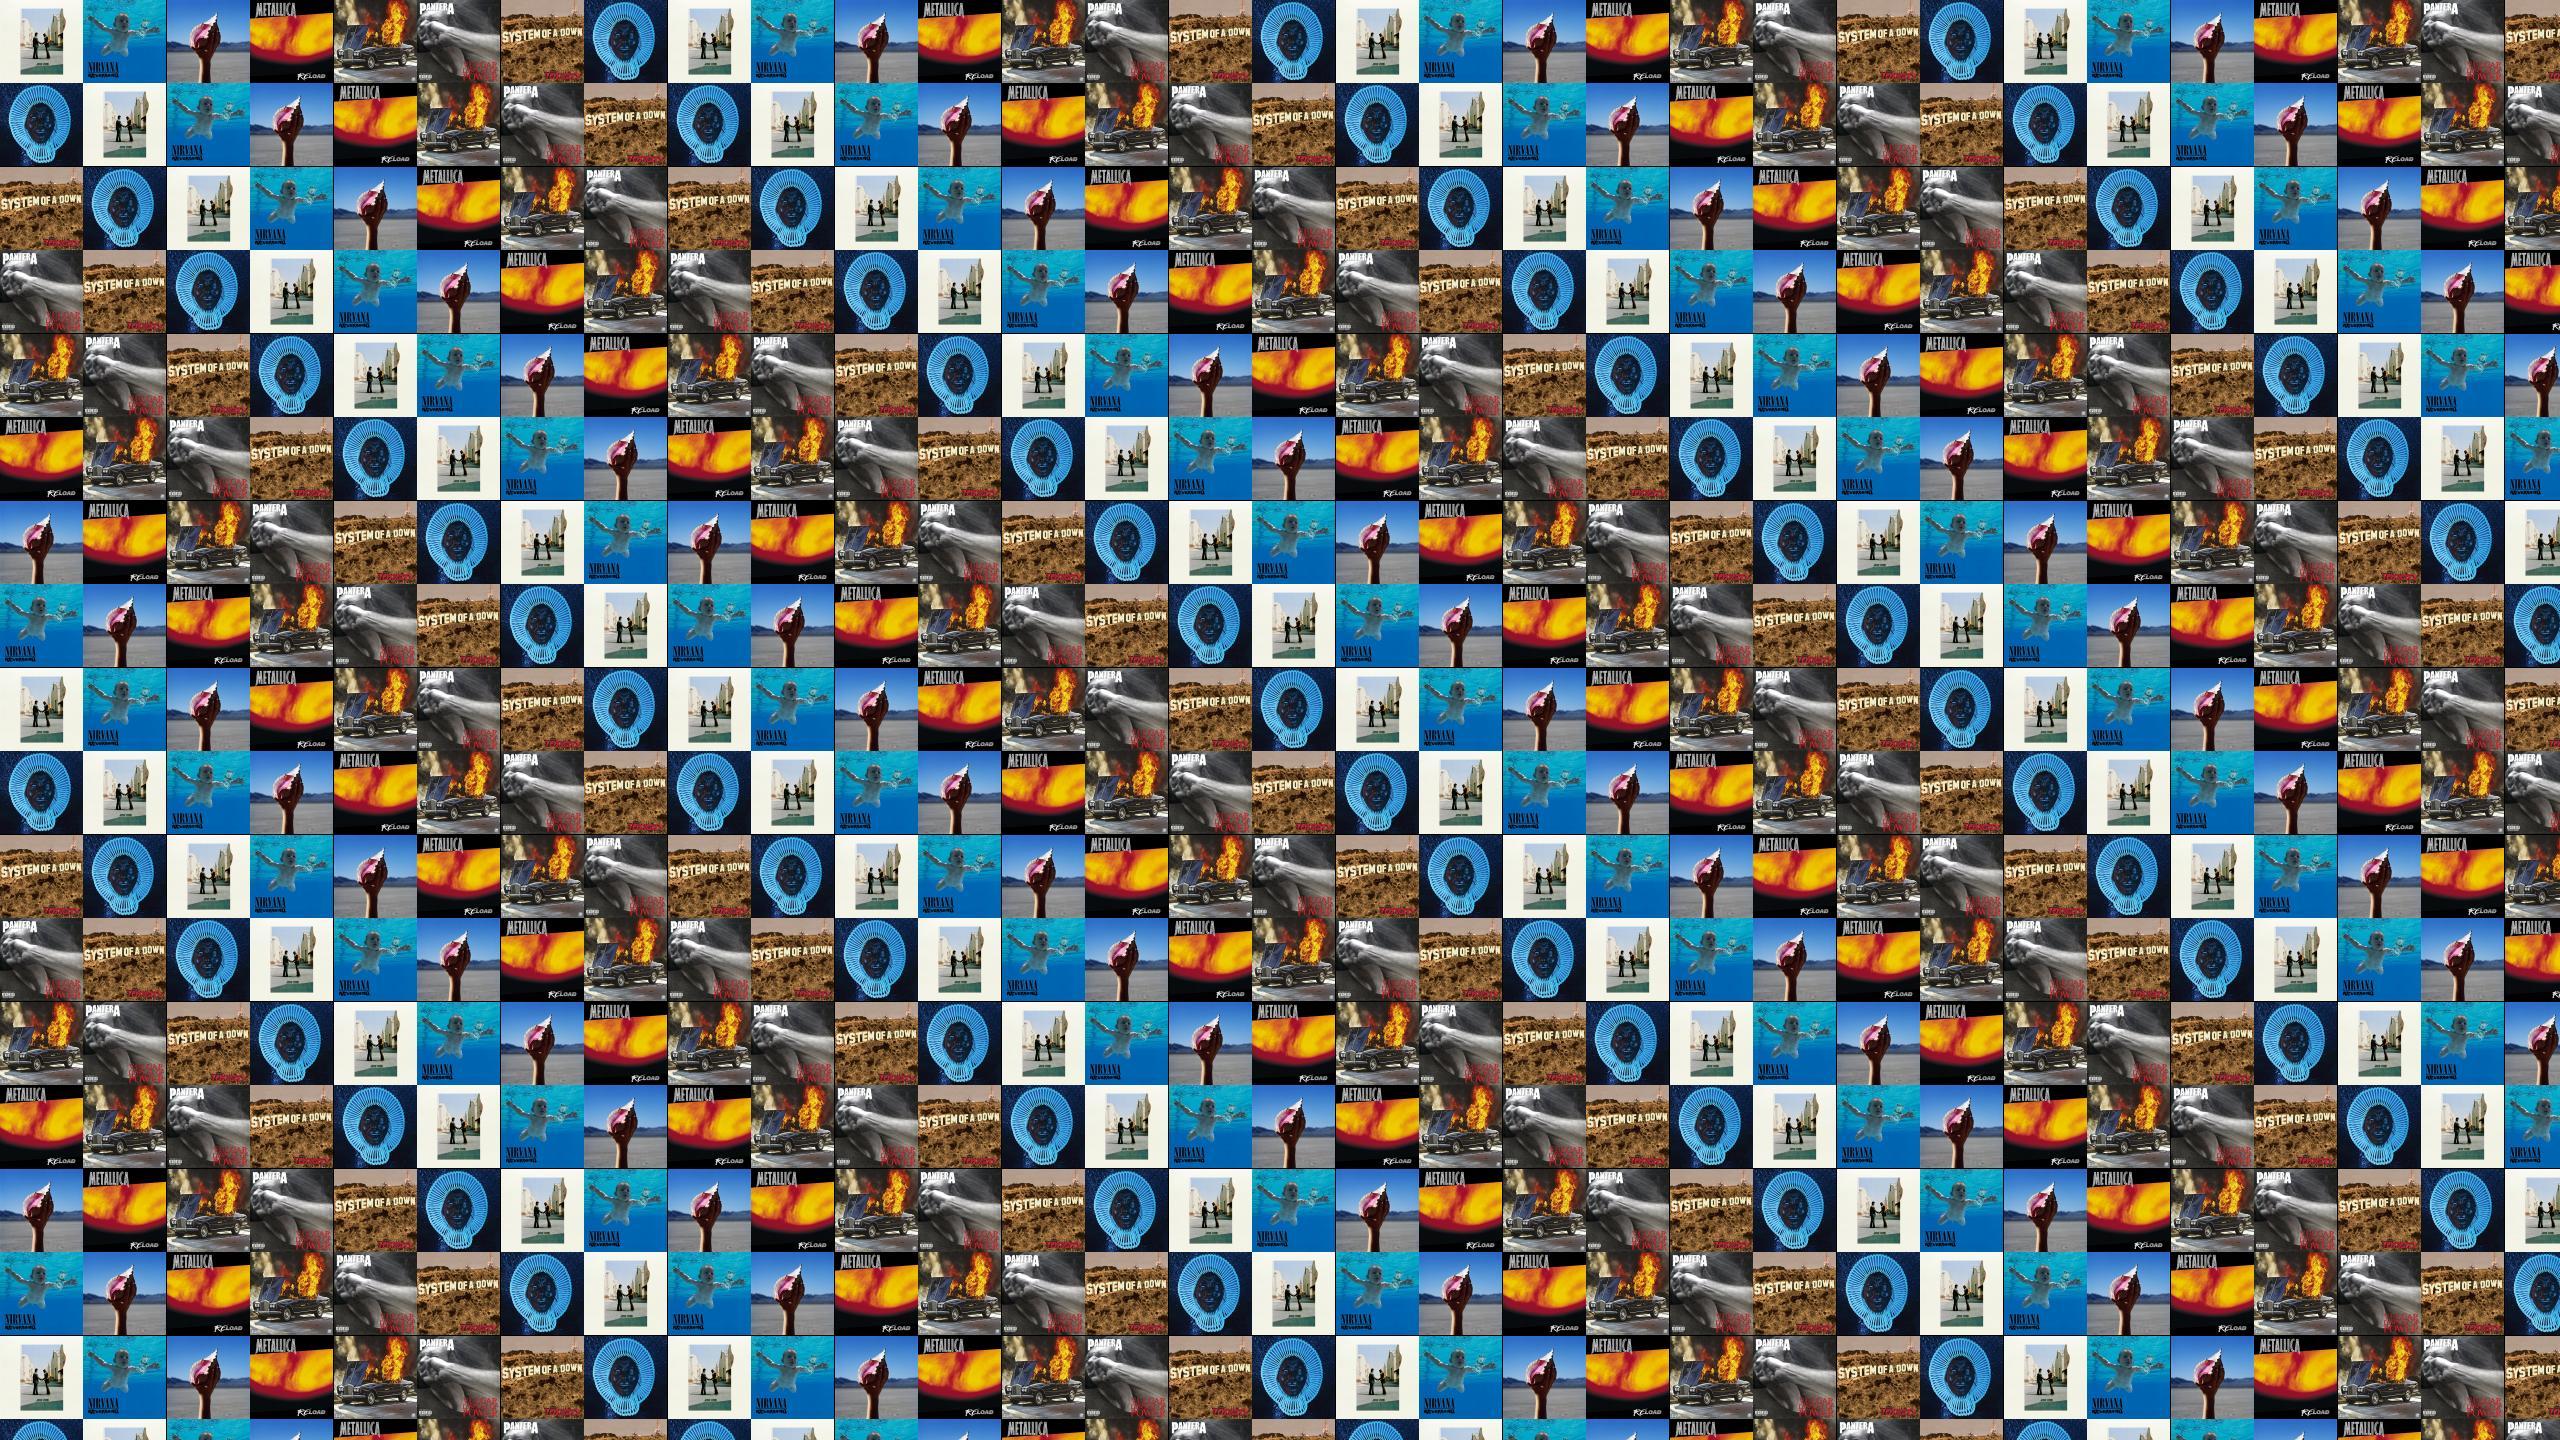 Pantera Tiled Desktop Wallpaper